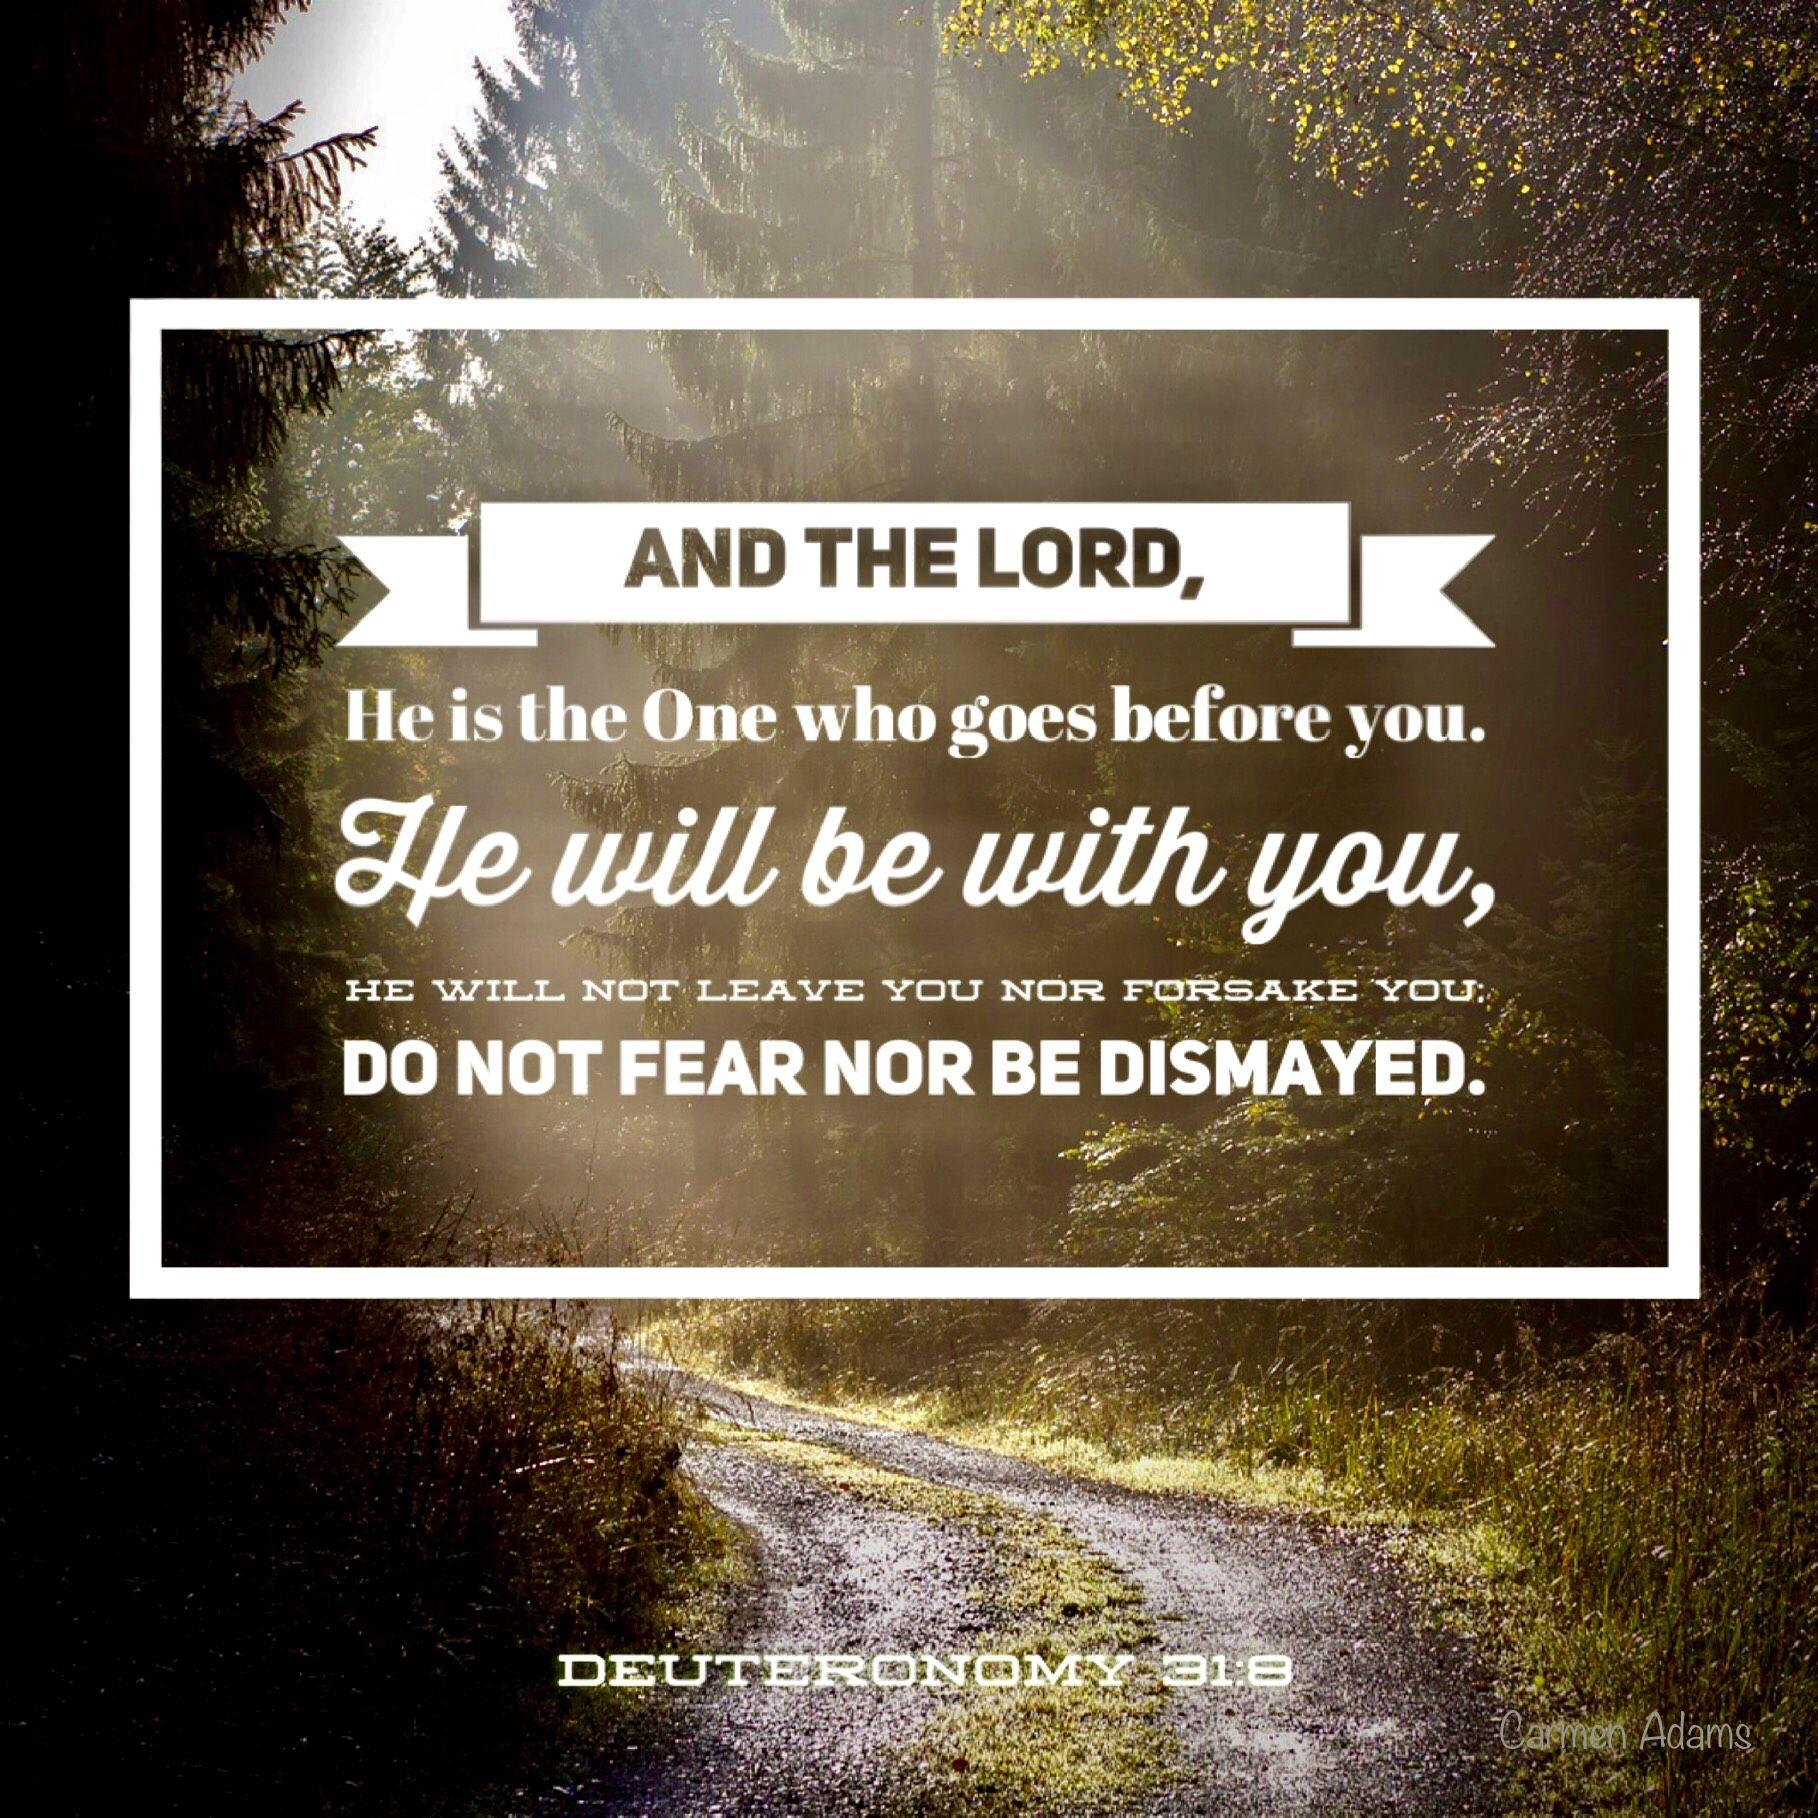 Deuteronomy 31:8 #bible in 2020 | Deuteronomy 31 ...